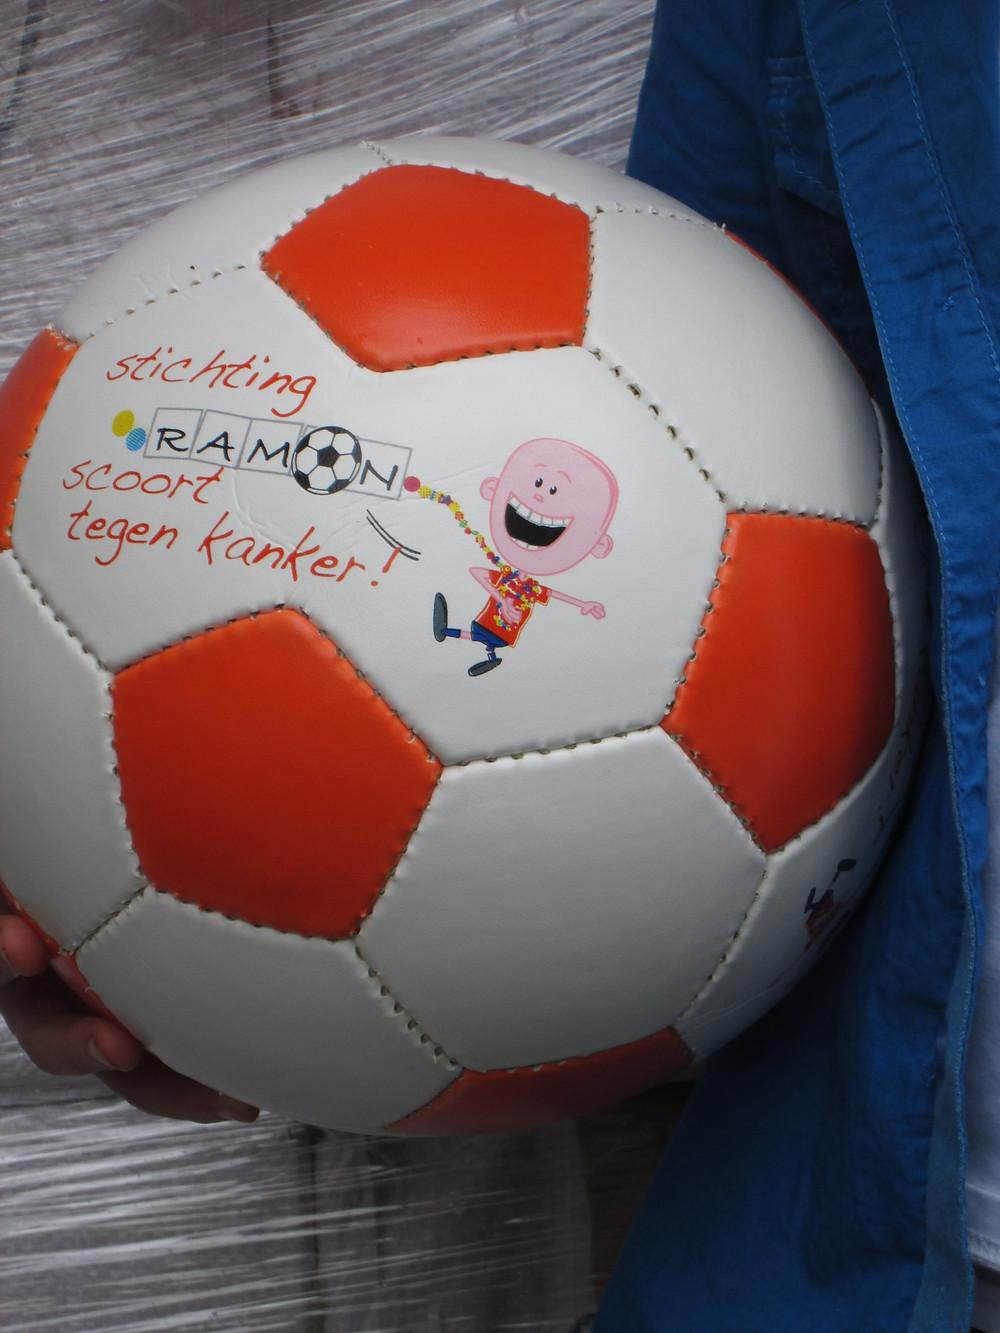 Stichting Ramon scoort tegen kanker - voetbal.jpg